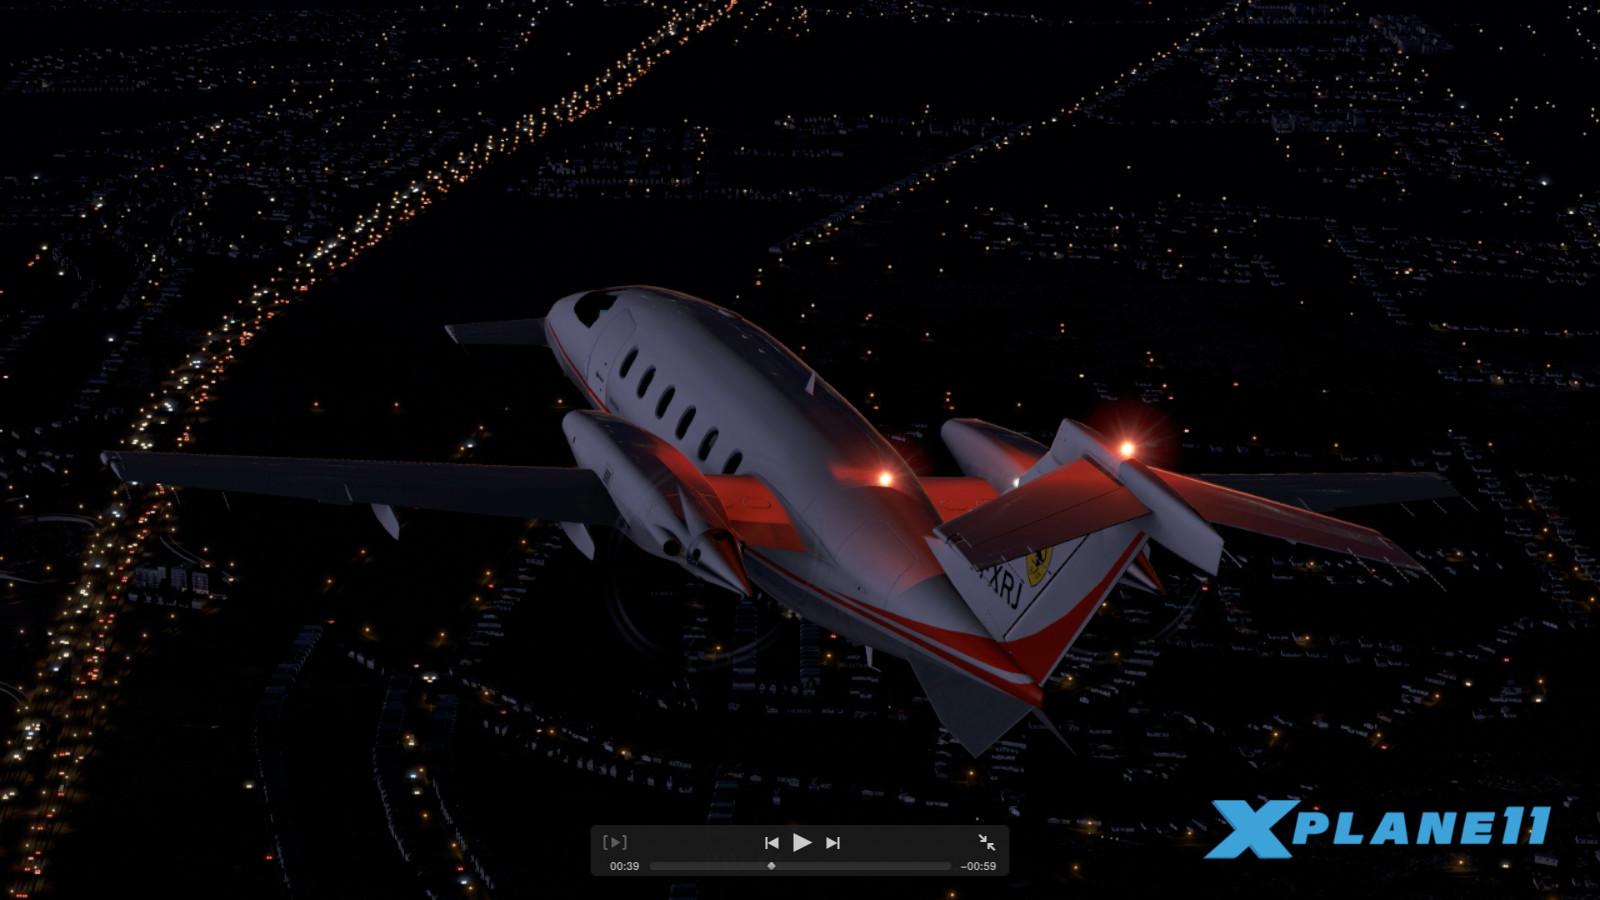 X-Plane 11 ESPAÑOL PC Full + Global Scenery DLC (CODEX) + REPACK 13 DVD5 (JPW) 5